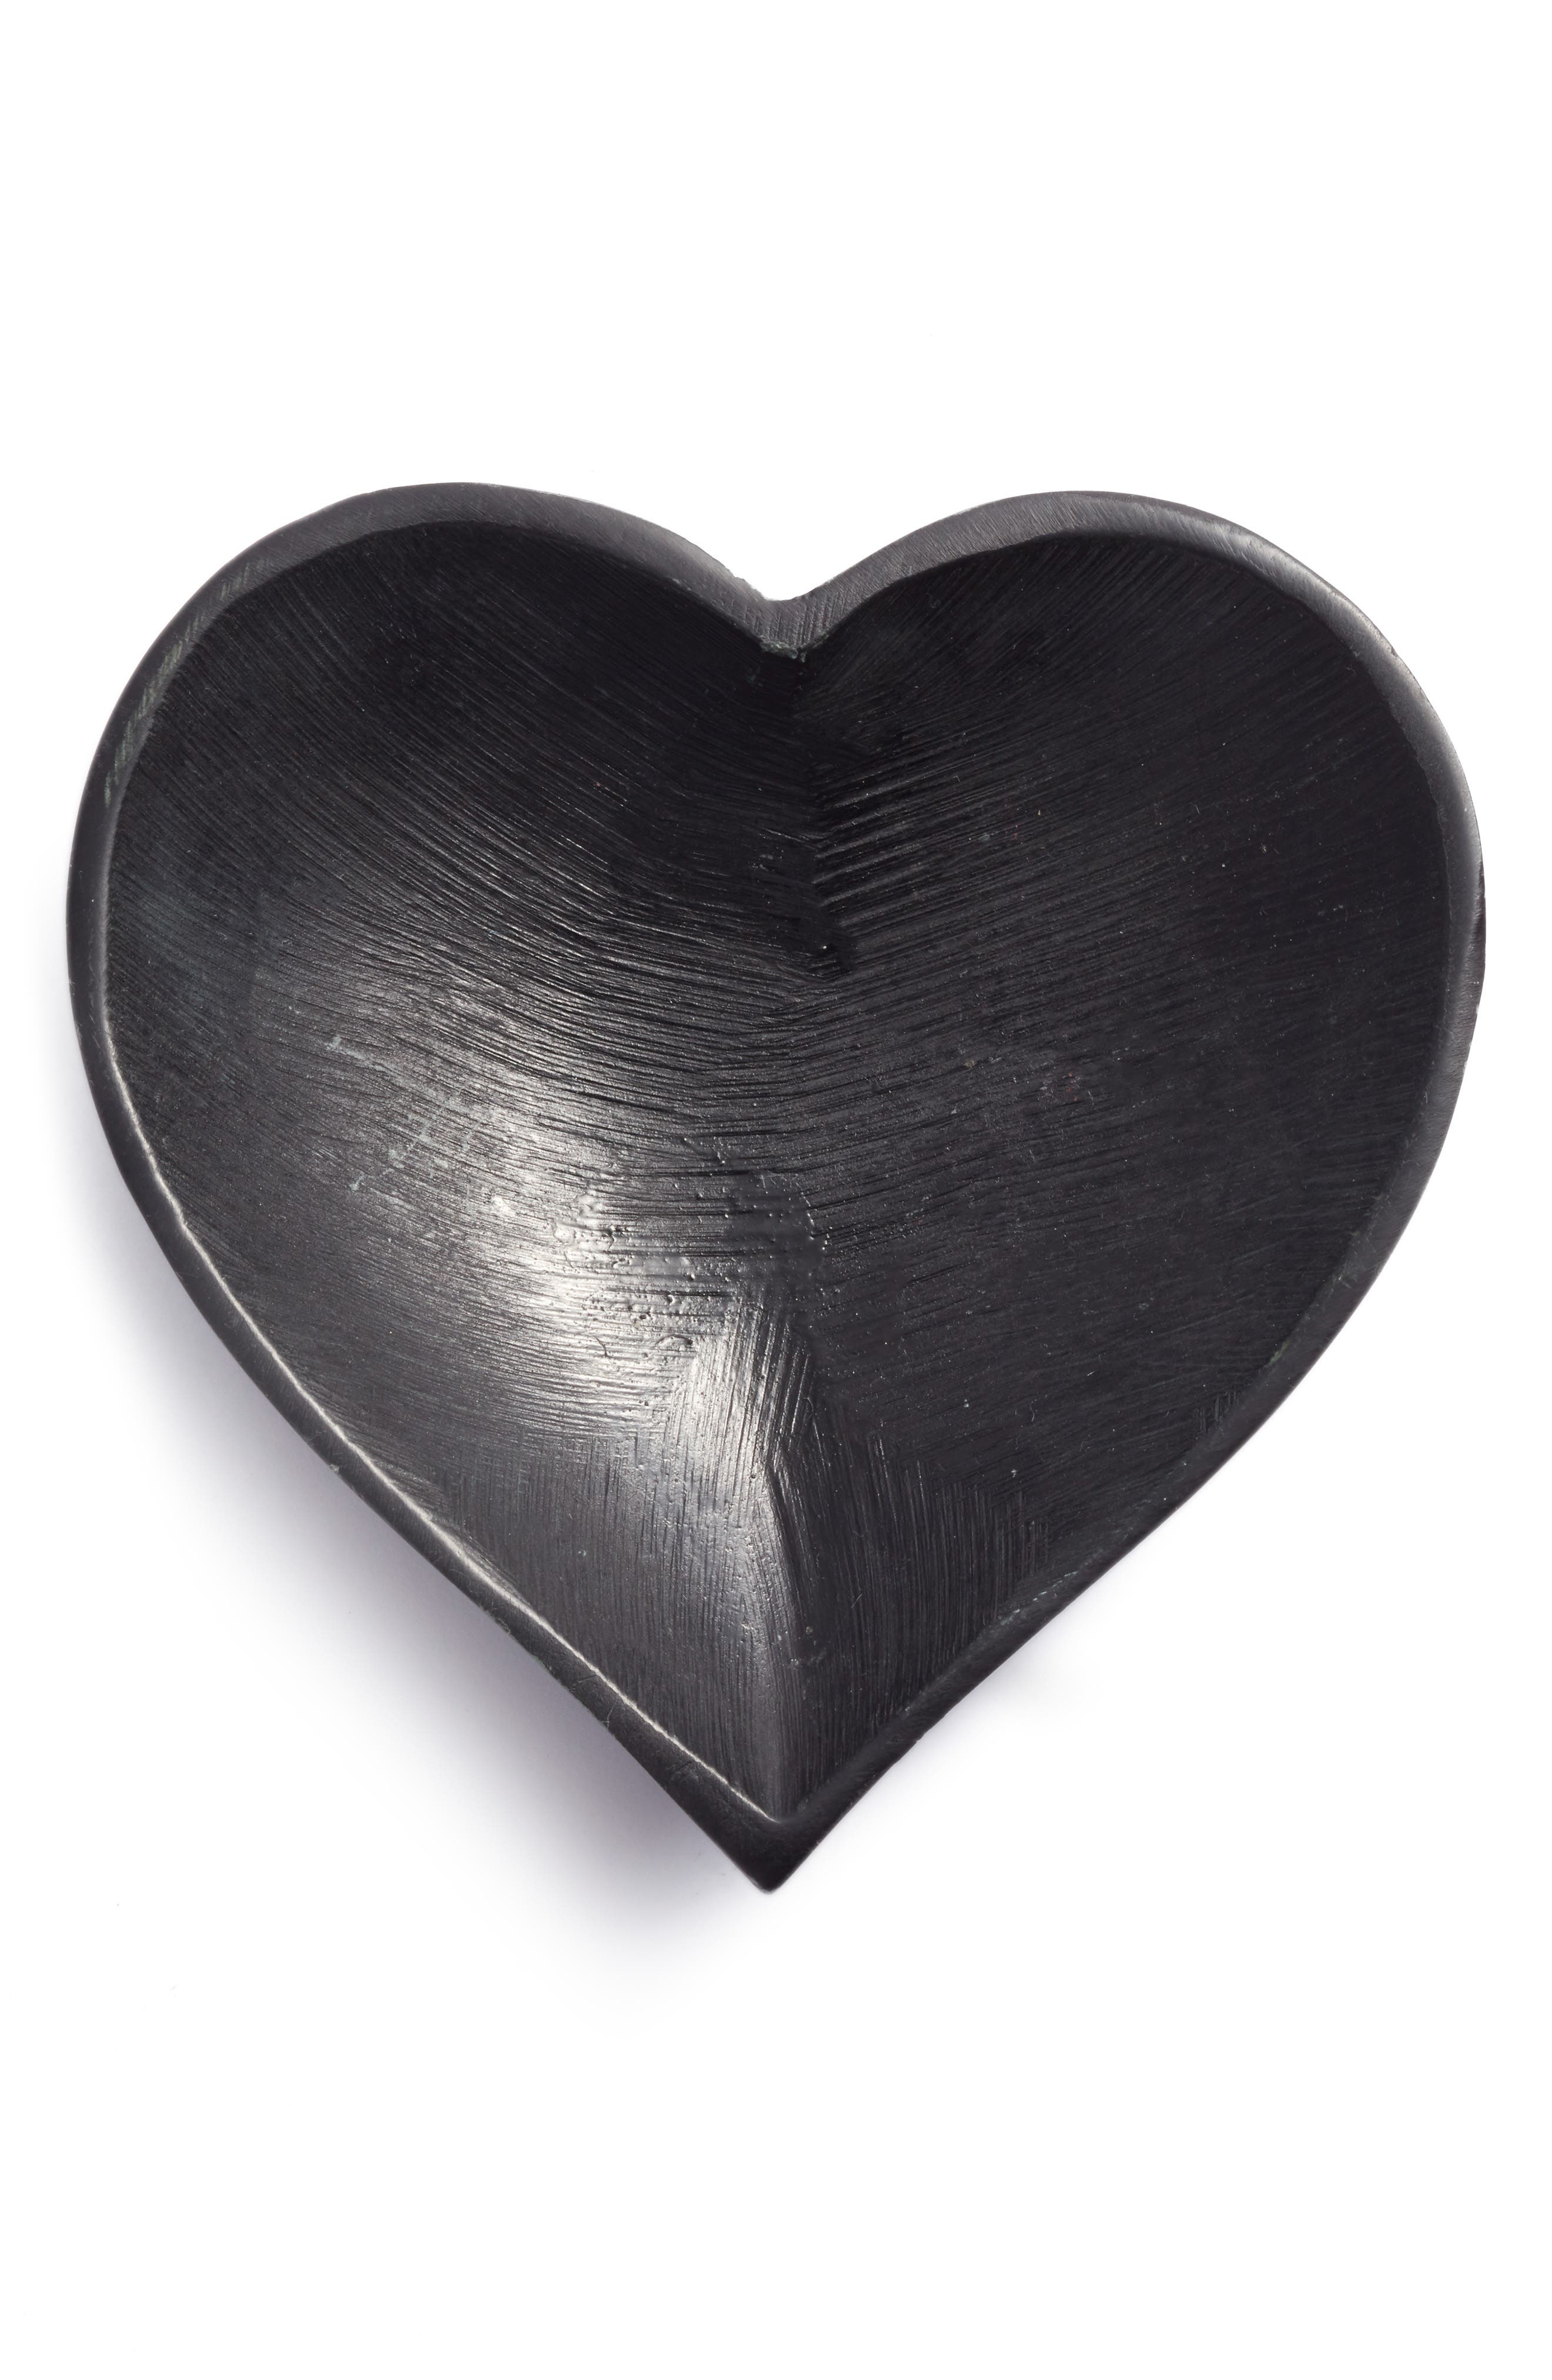 Soapstone Heart Bowl,                             Main thumbnail 1, color,                             001